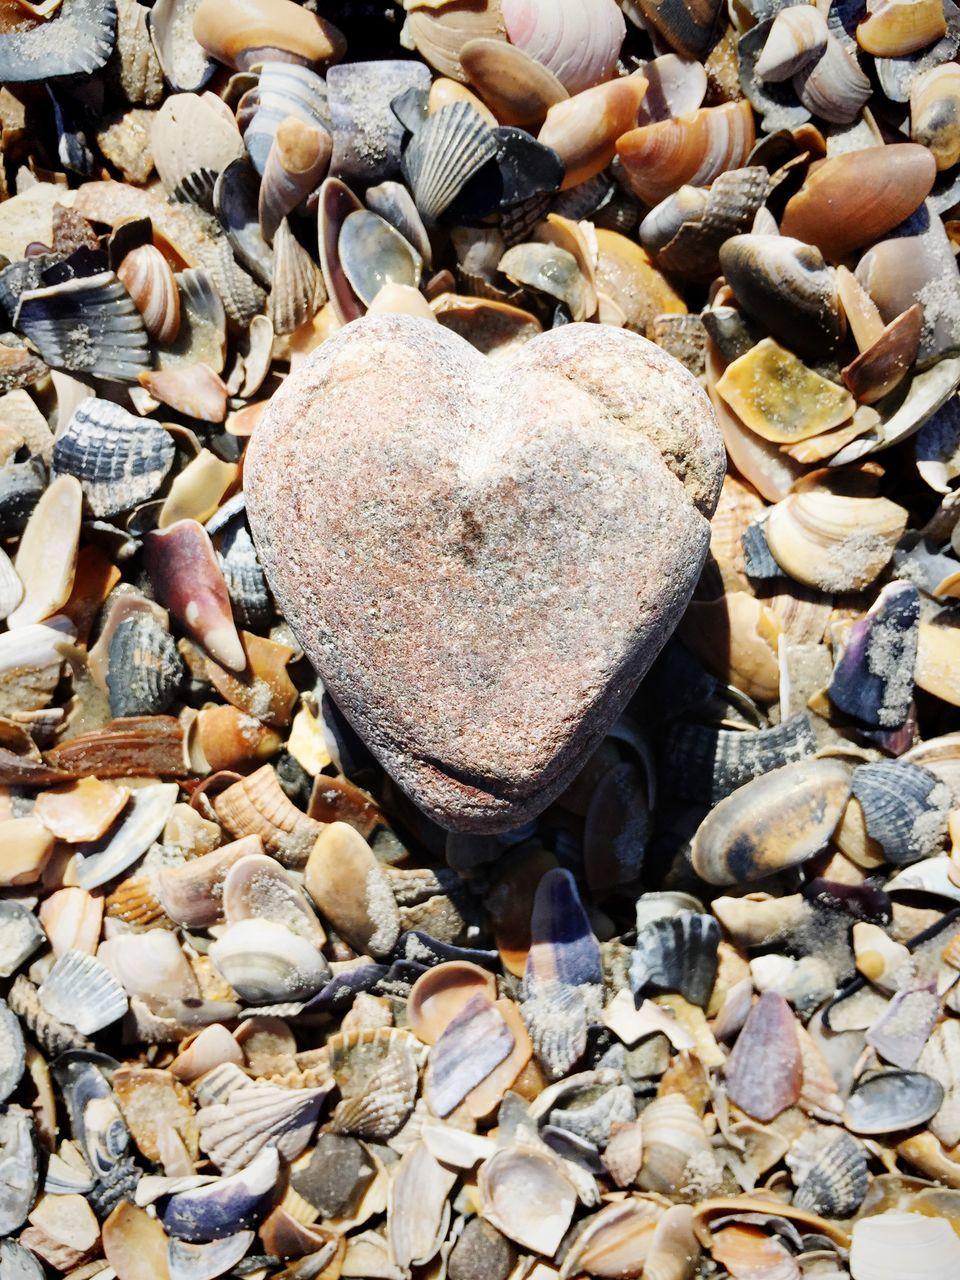 Stone Heart On Background Of Seashells